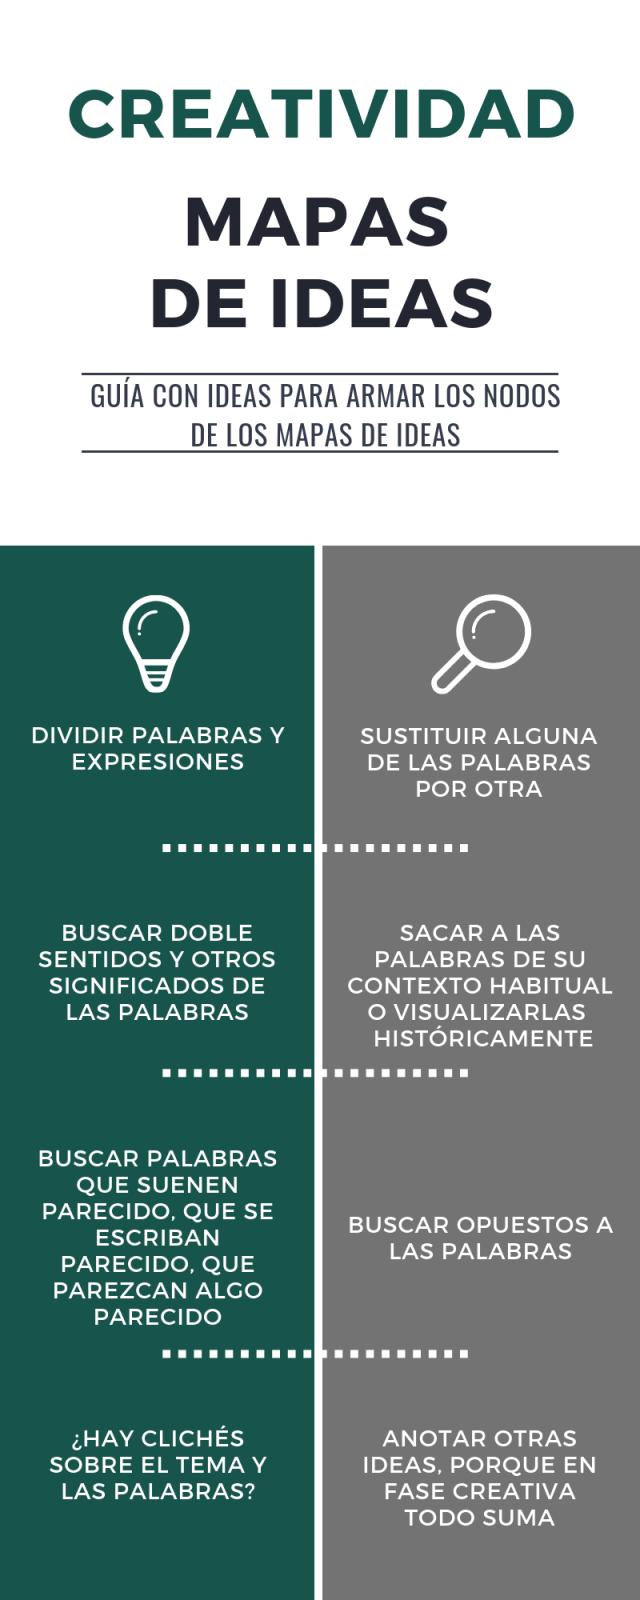 Mapa de ideas.png